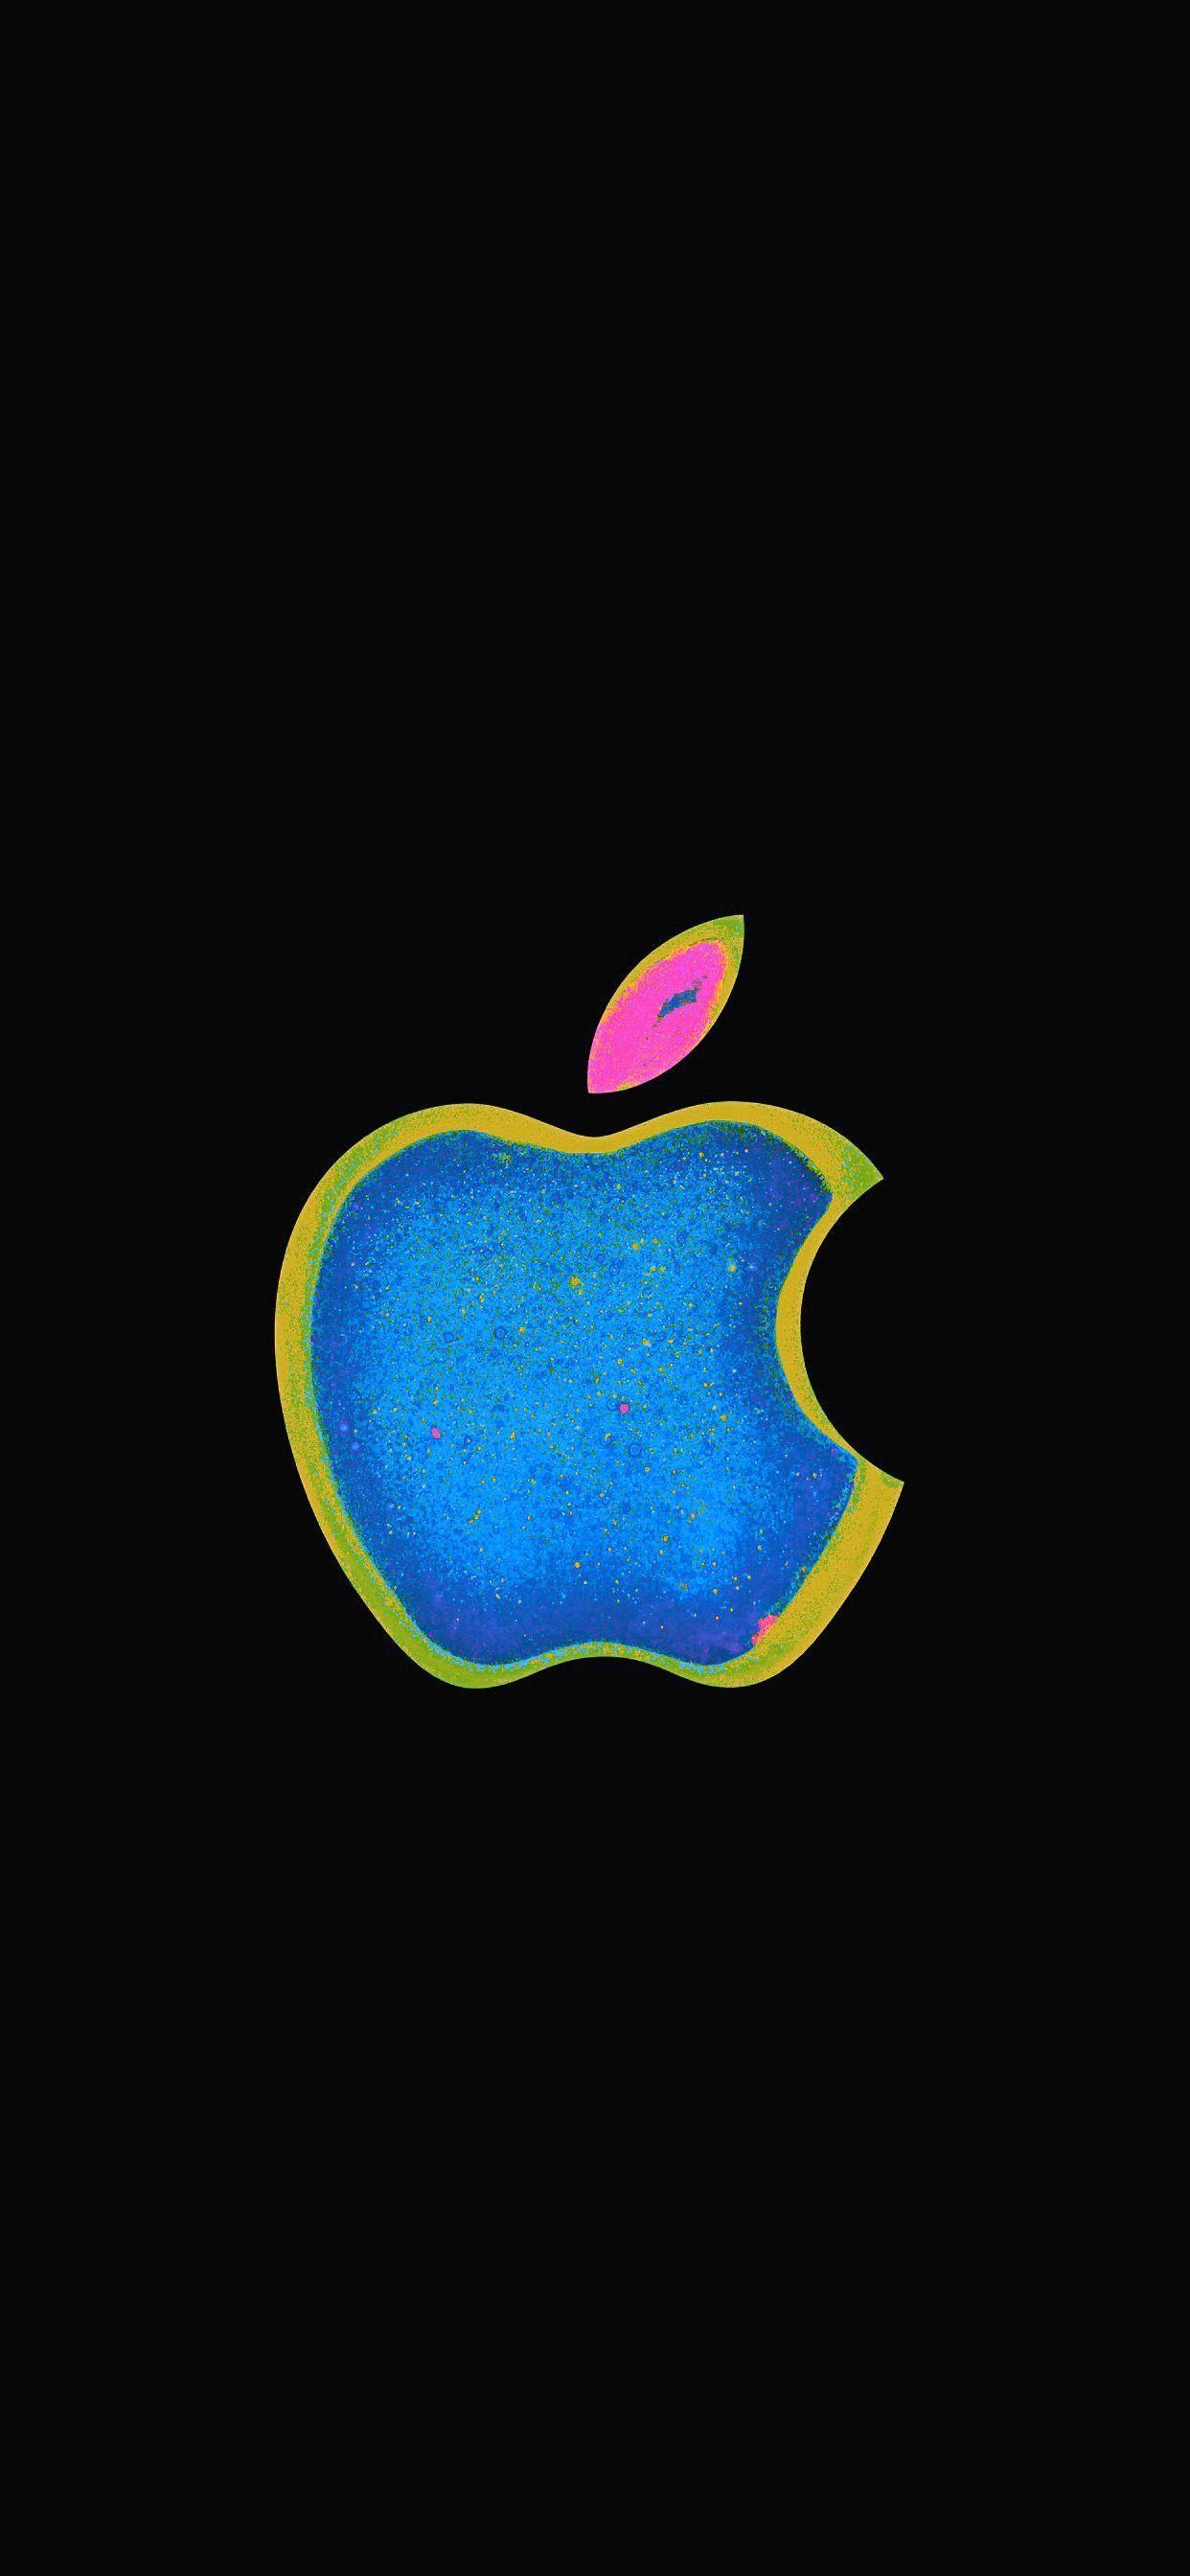 Applelogo Appleiphone Appleipad Ios13 Iphonewallpaper Get Your Free Iphone 11 Pro Or Apple In 2020 Apple Logo Wallpaper Iphone Apple Logo Wallpaper Apple Logo